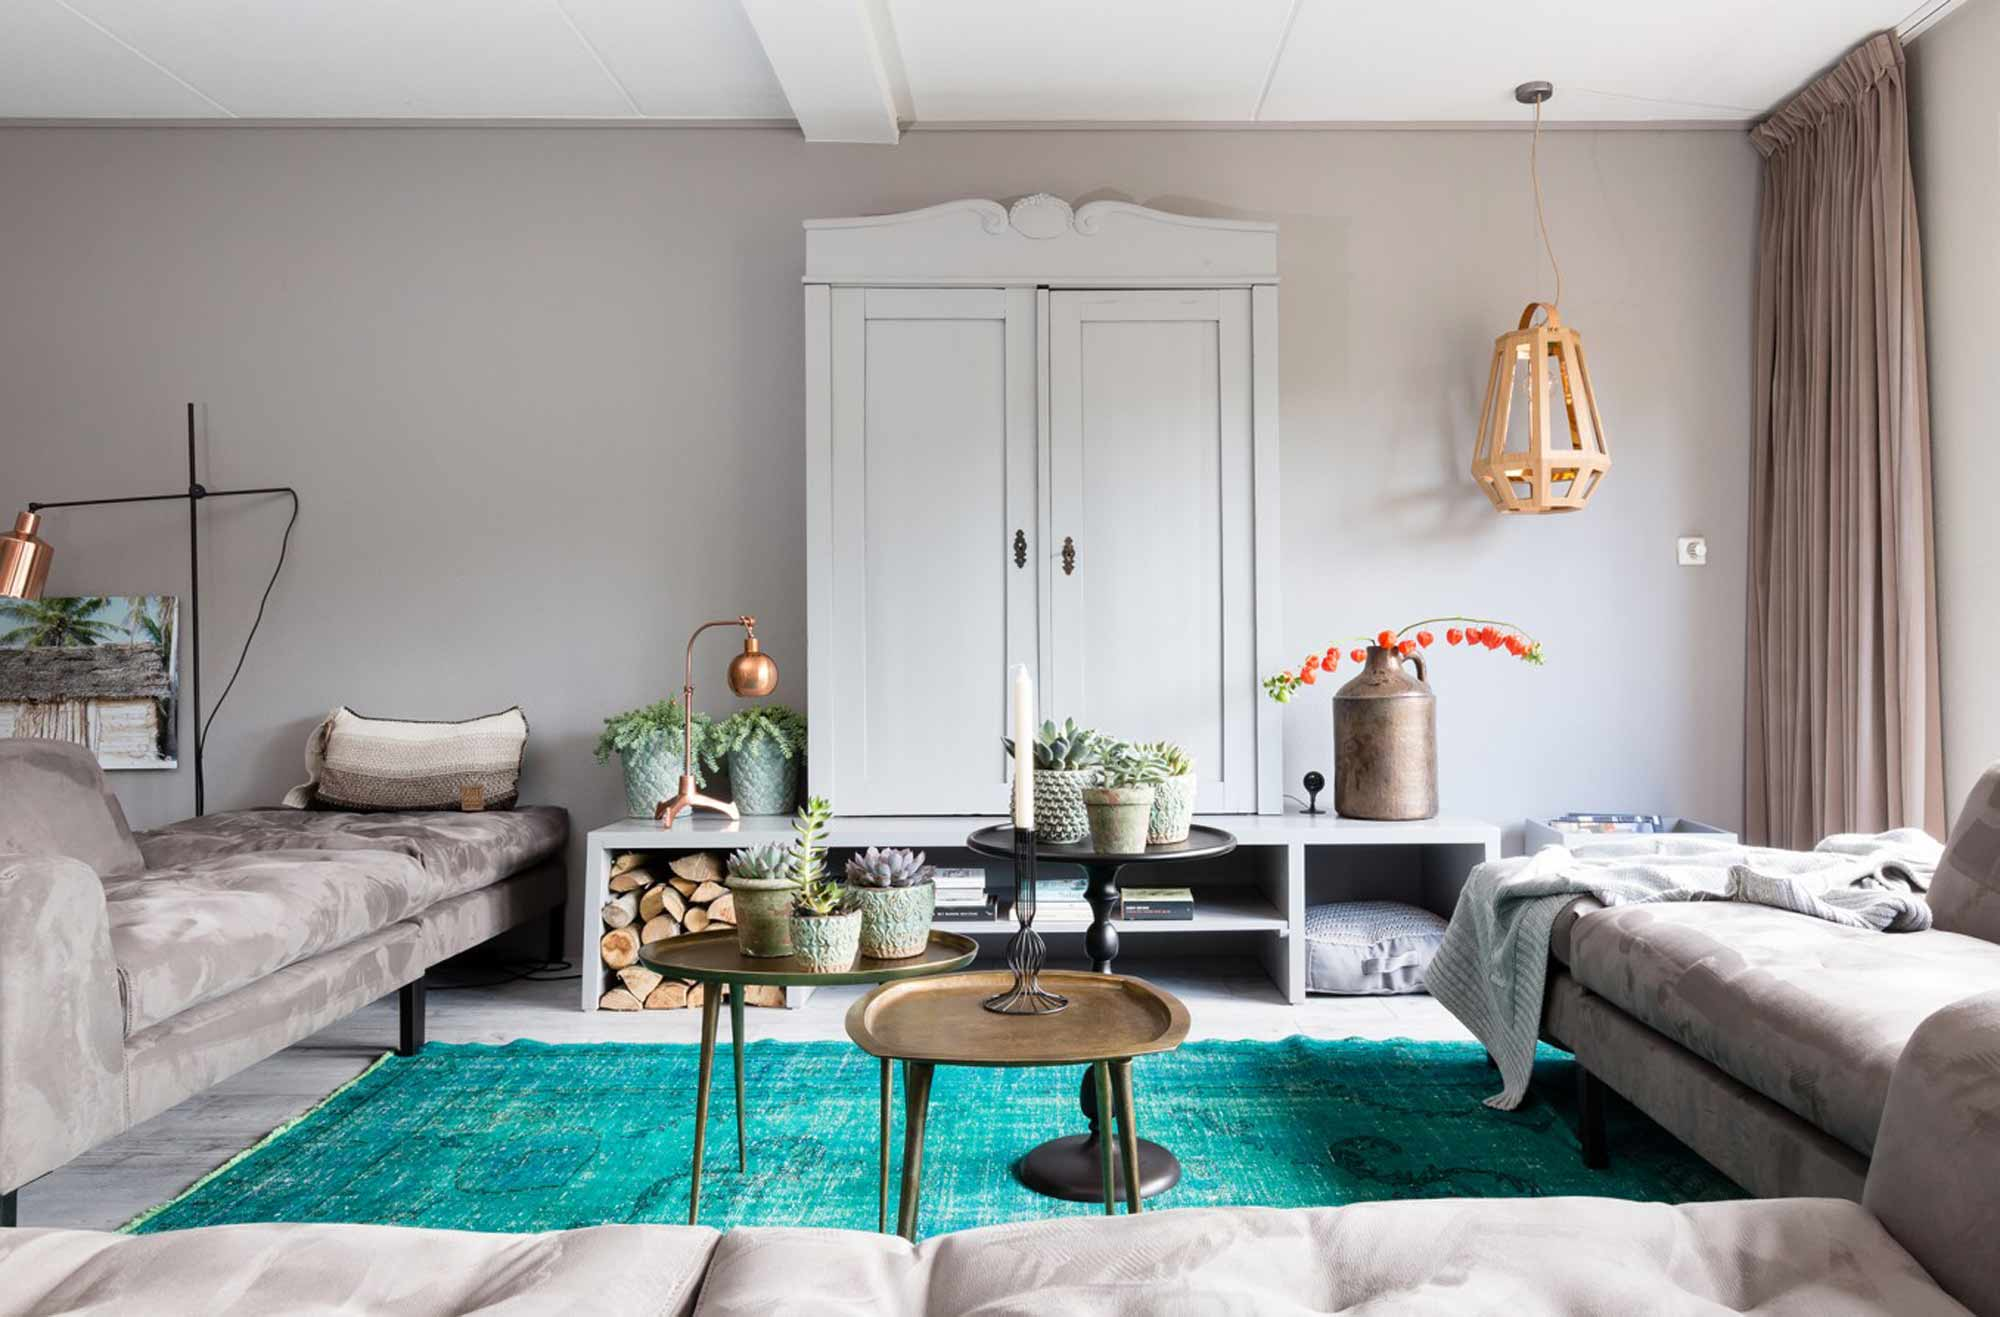 Landelijke stijl tv-kast woonkamer